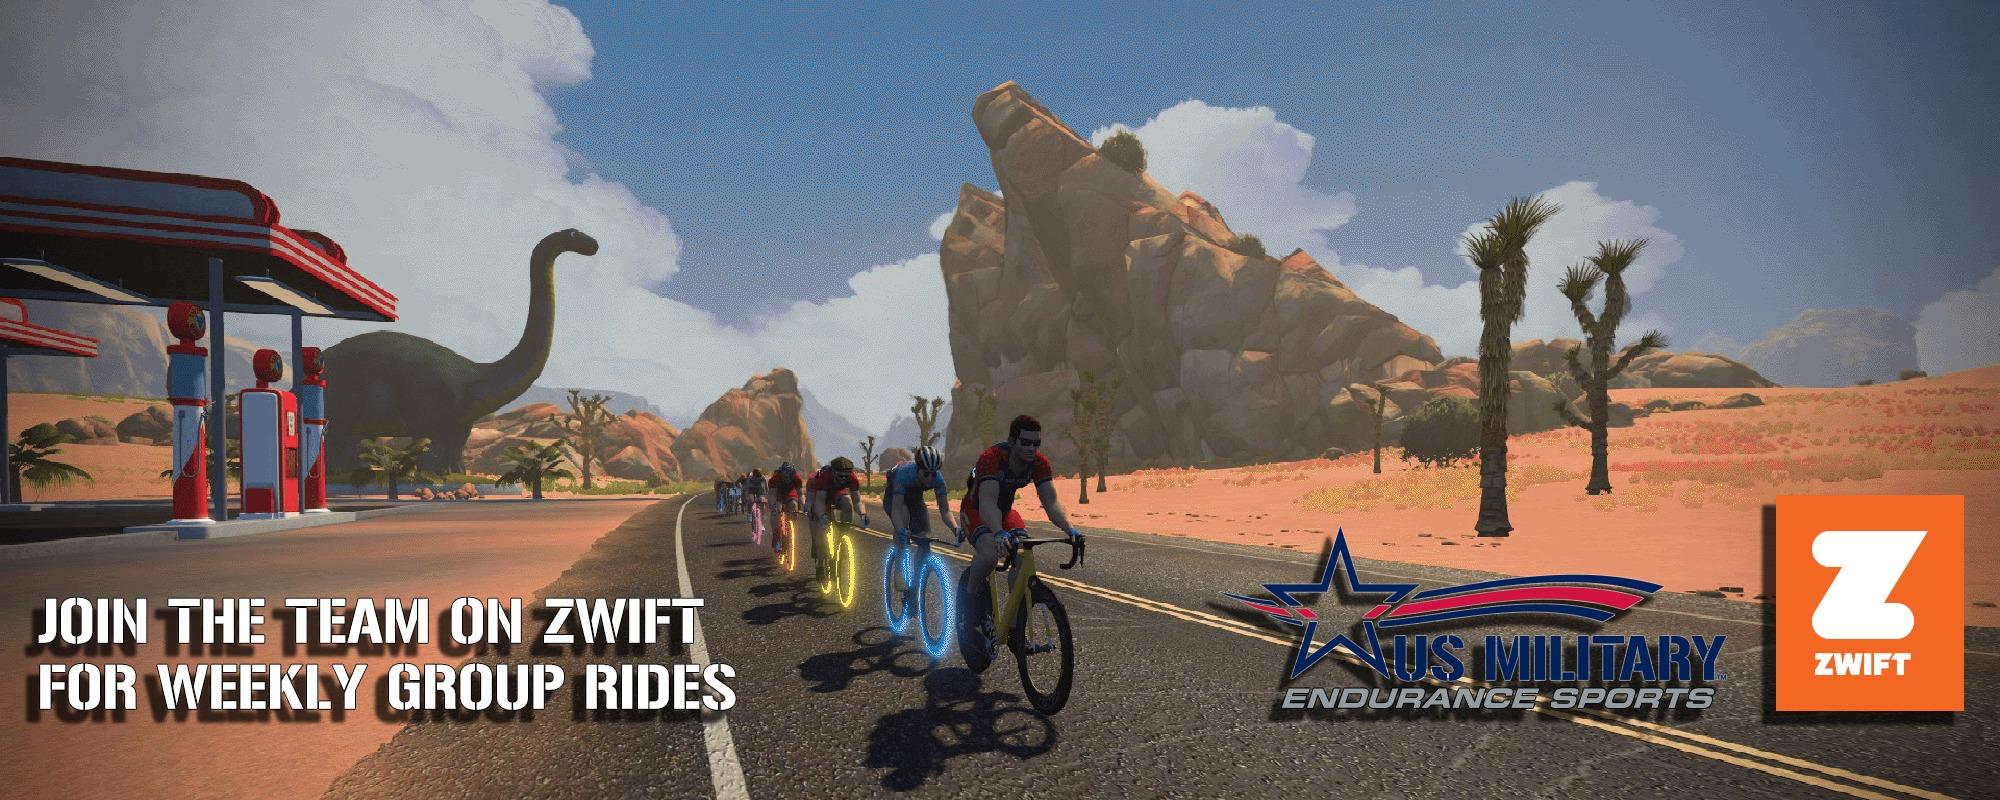 Zwift Us Military Endurance Sports